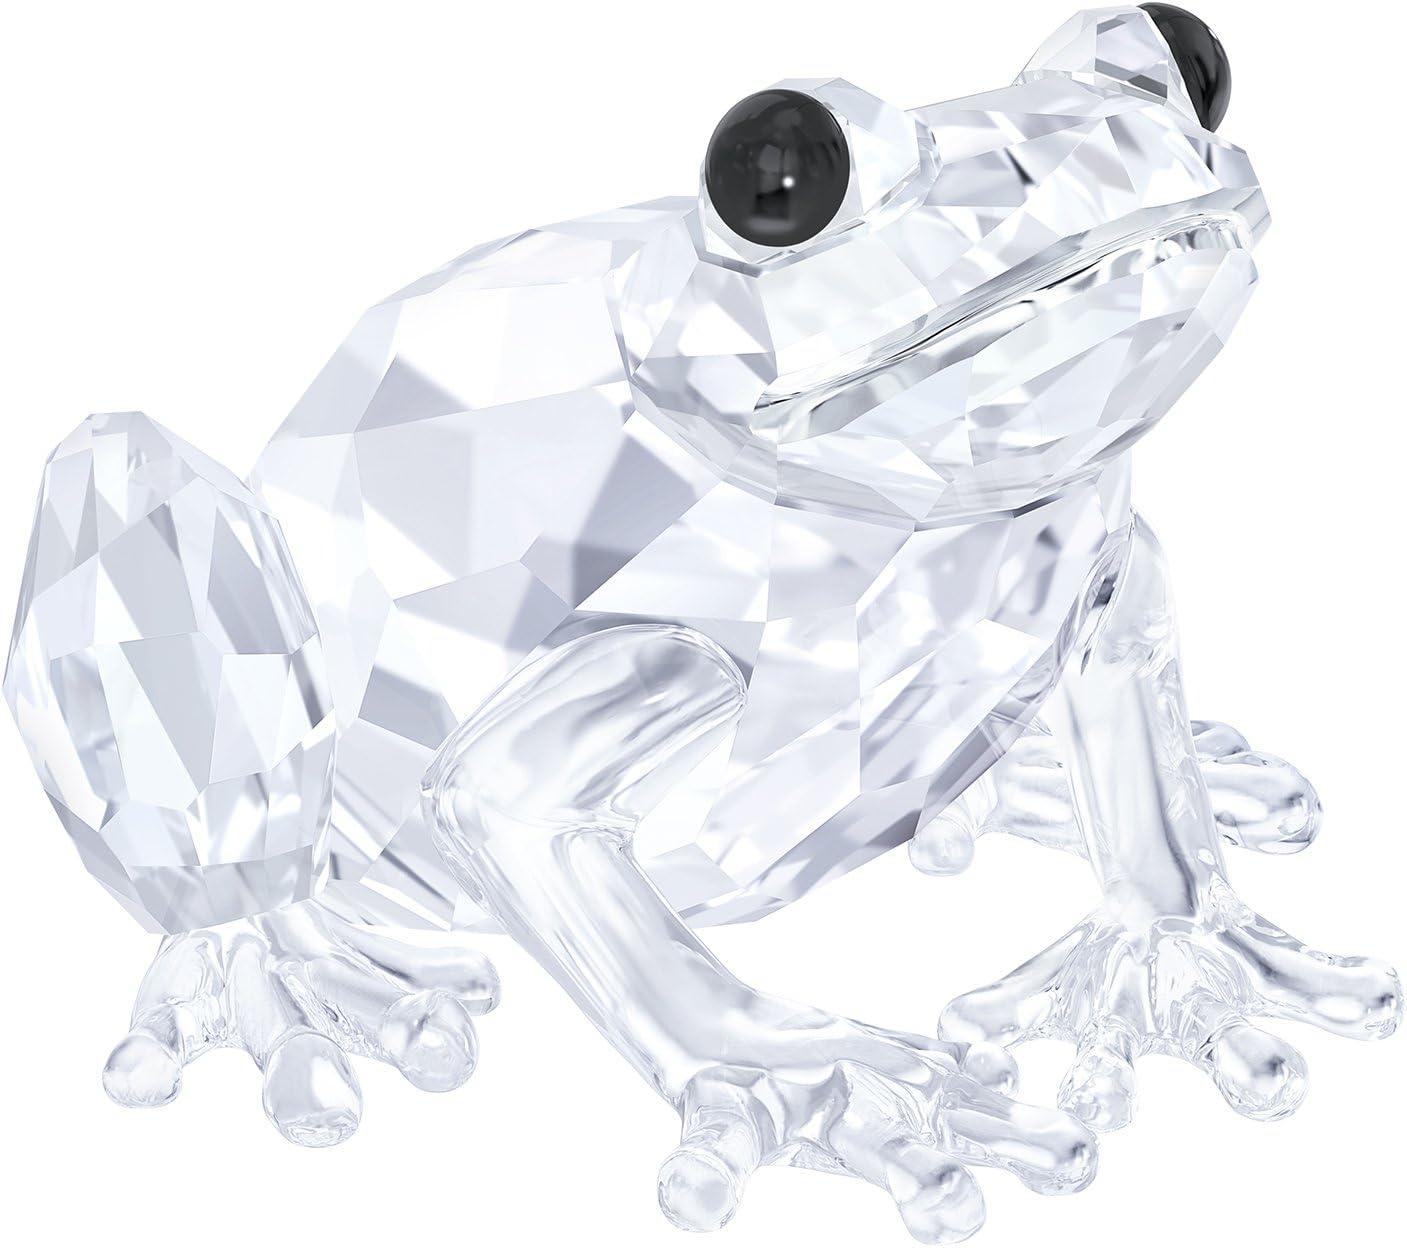 Swarovski Frog Figurine, Crystal, Transparent, 2.5 x 3.6 x 3.7 cm